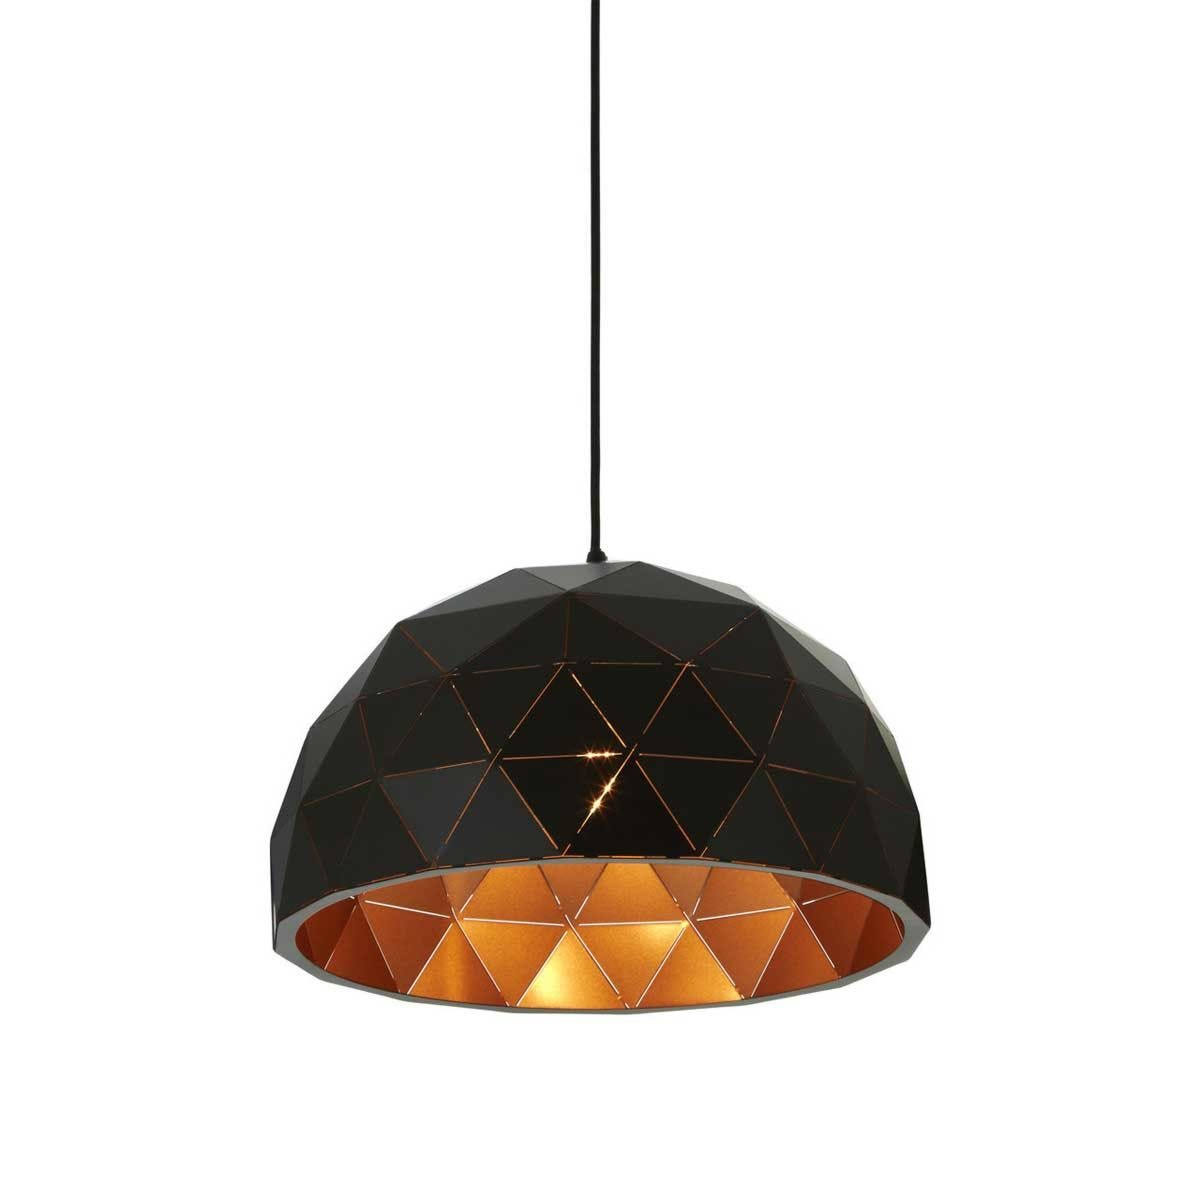 Premier Housewares Mateo Small Dome Pendant Light - Matt Black